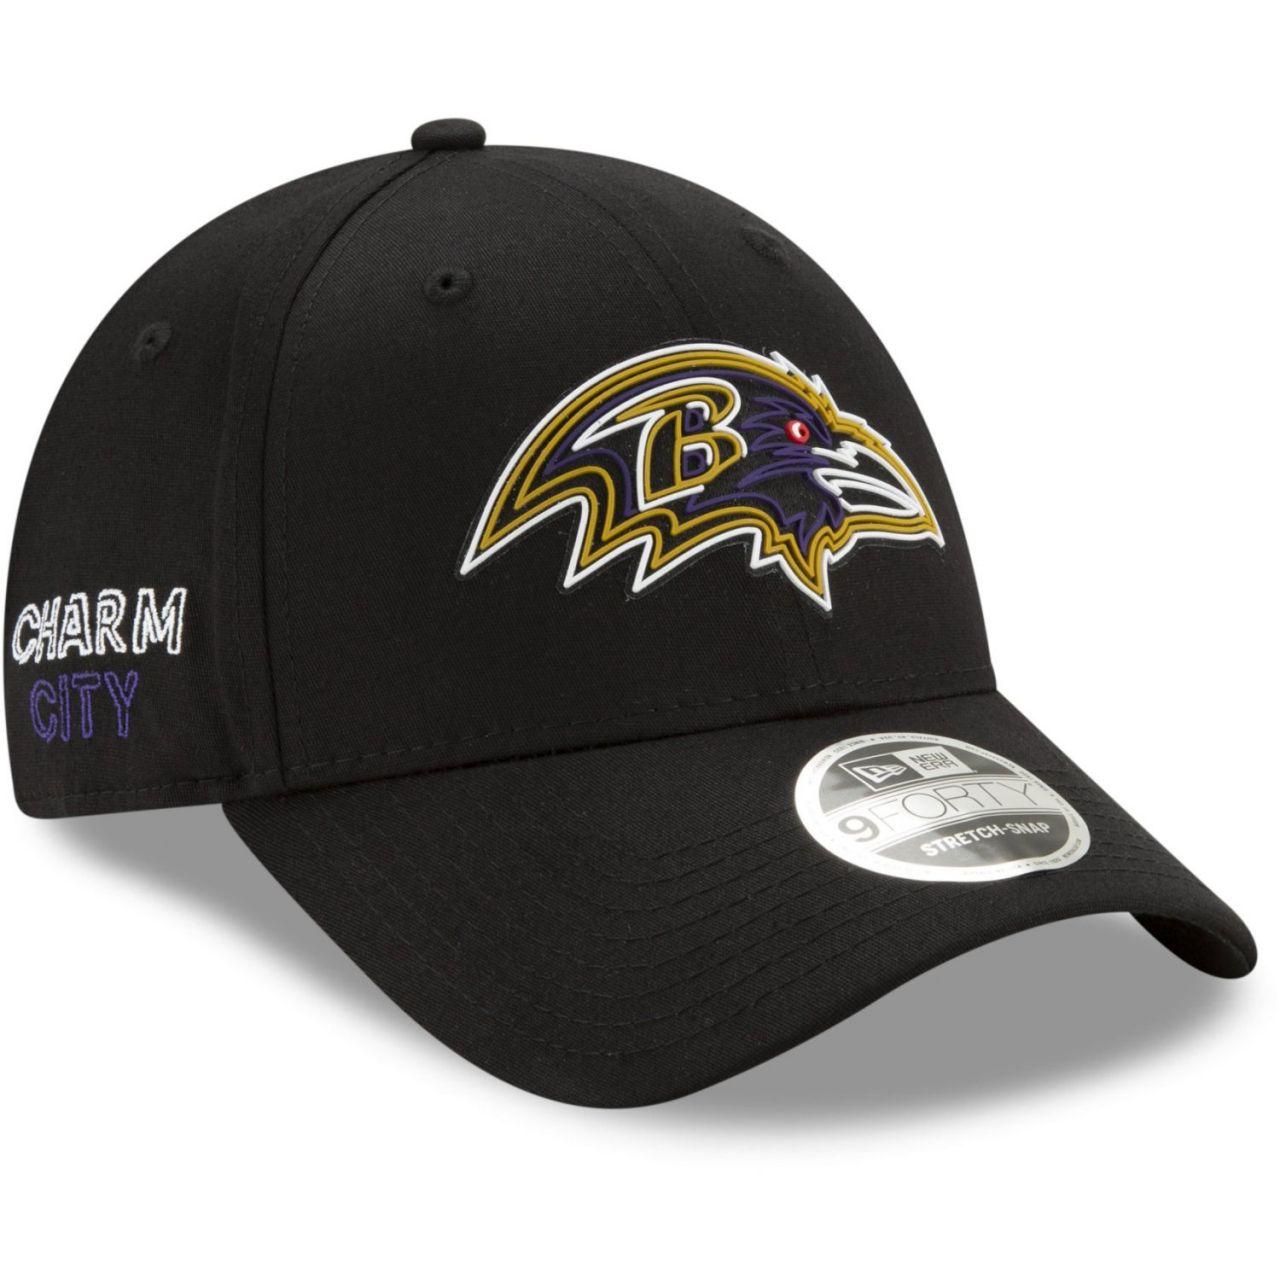 amfoo - New Era 9FORTY Stretch Snap Cap 2020 DRAFT Baltimore Ravens